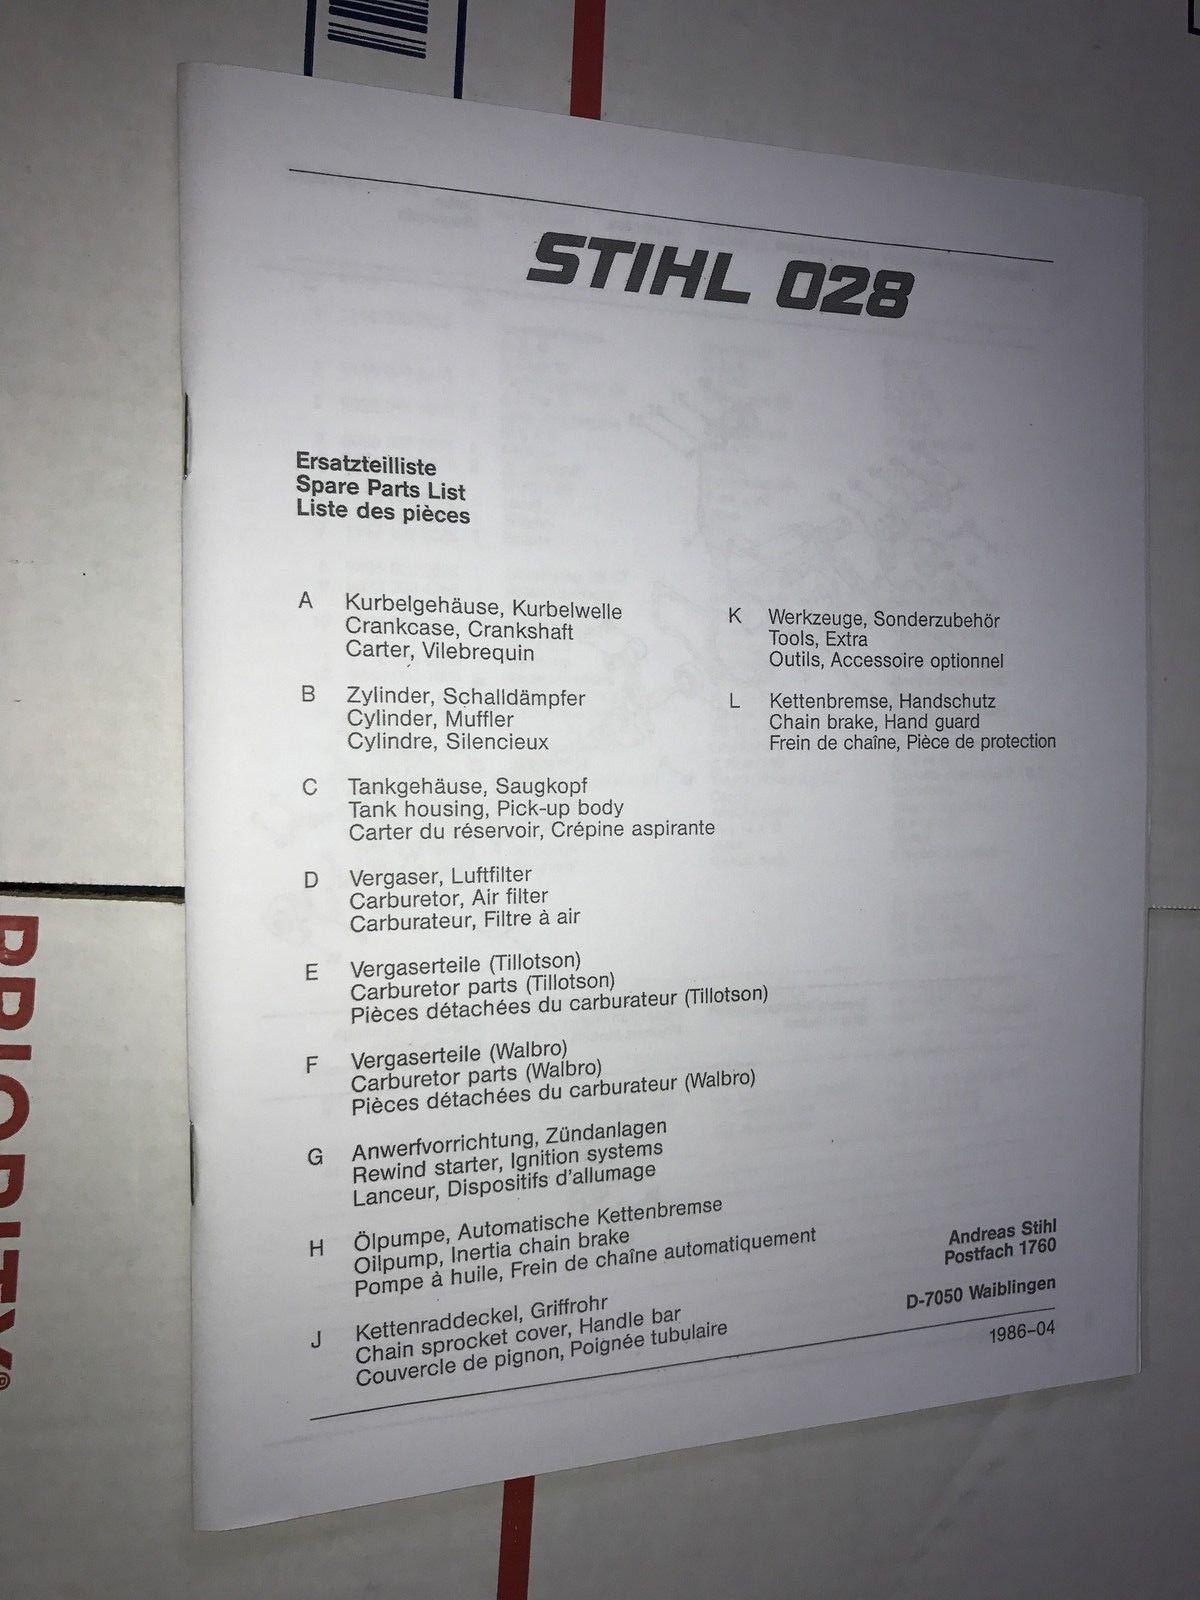 Stihl Farm Boss Parts Diagram Also Furthermore Chainsaw Carburetor Av Super Wood Manual Ebay 1200x1600